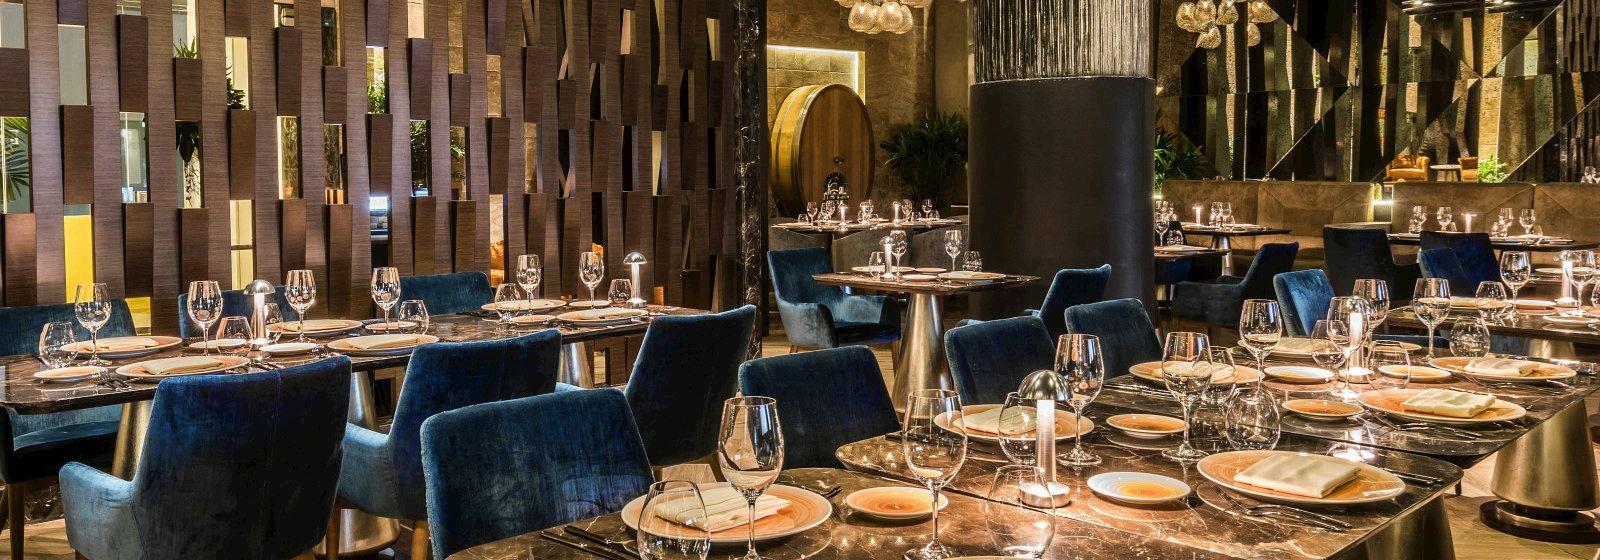 Restaurante Italiano Lucca en Grand Velas Riviera Nayarit